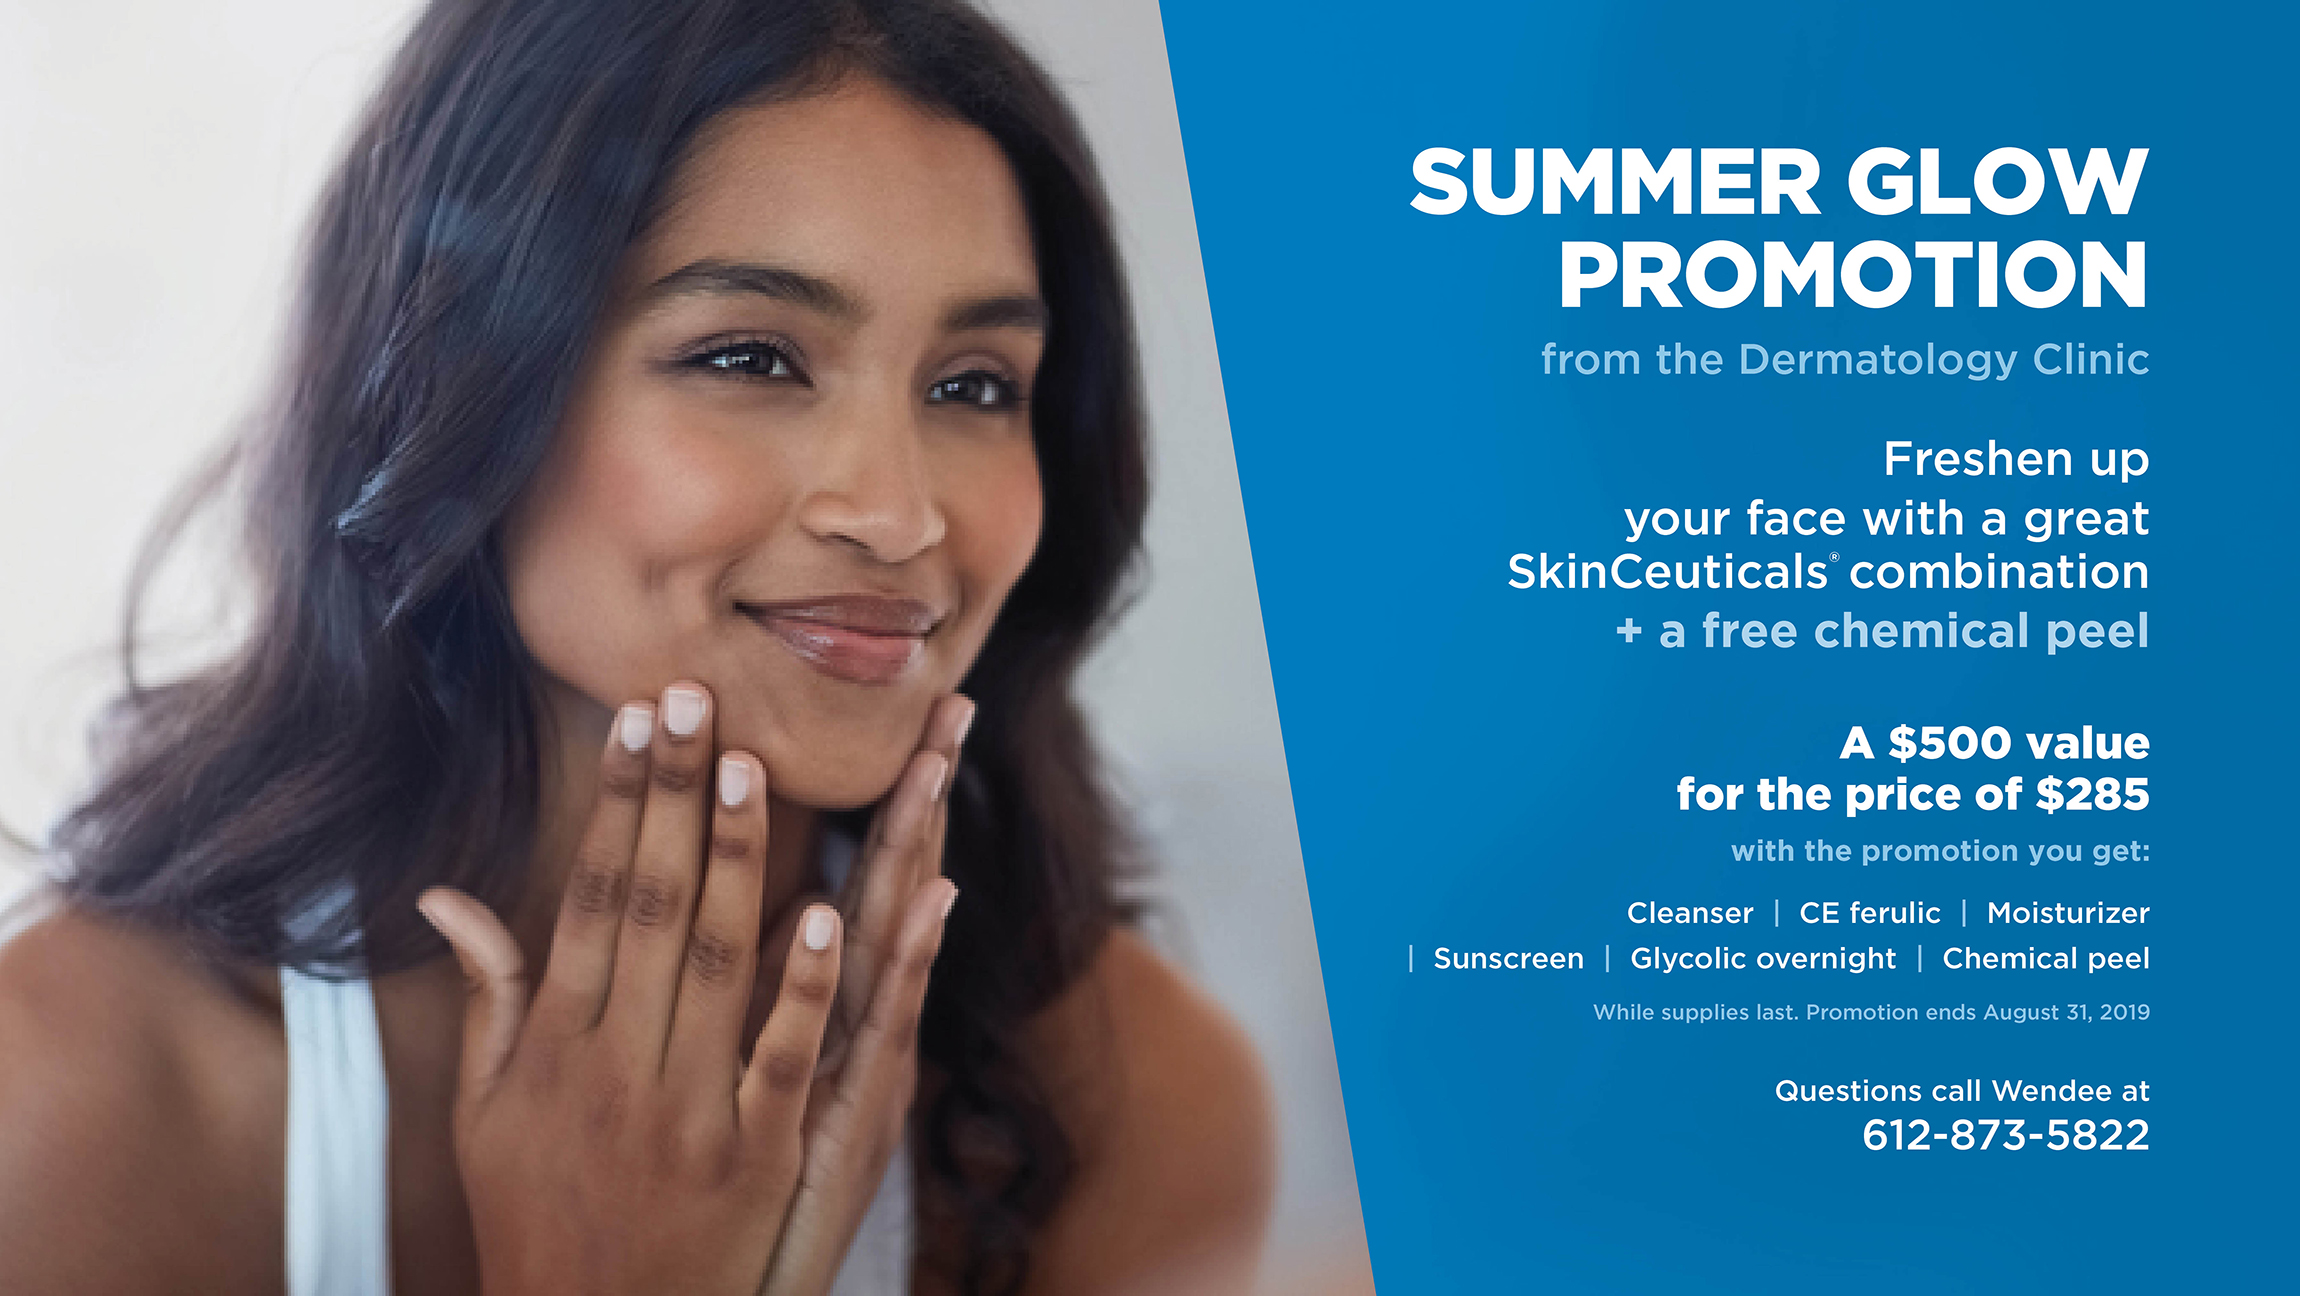 cosmetic dermatology promotion